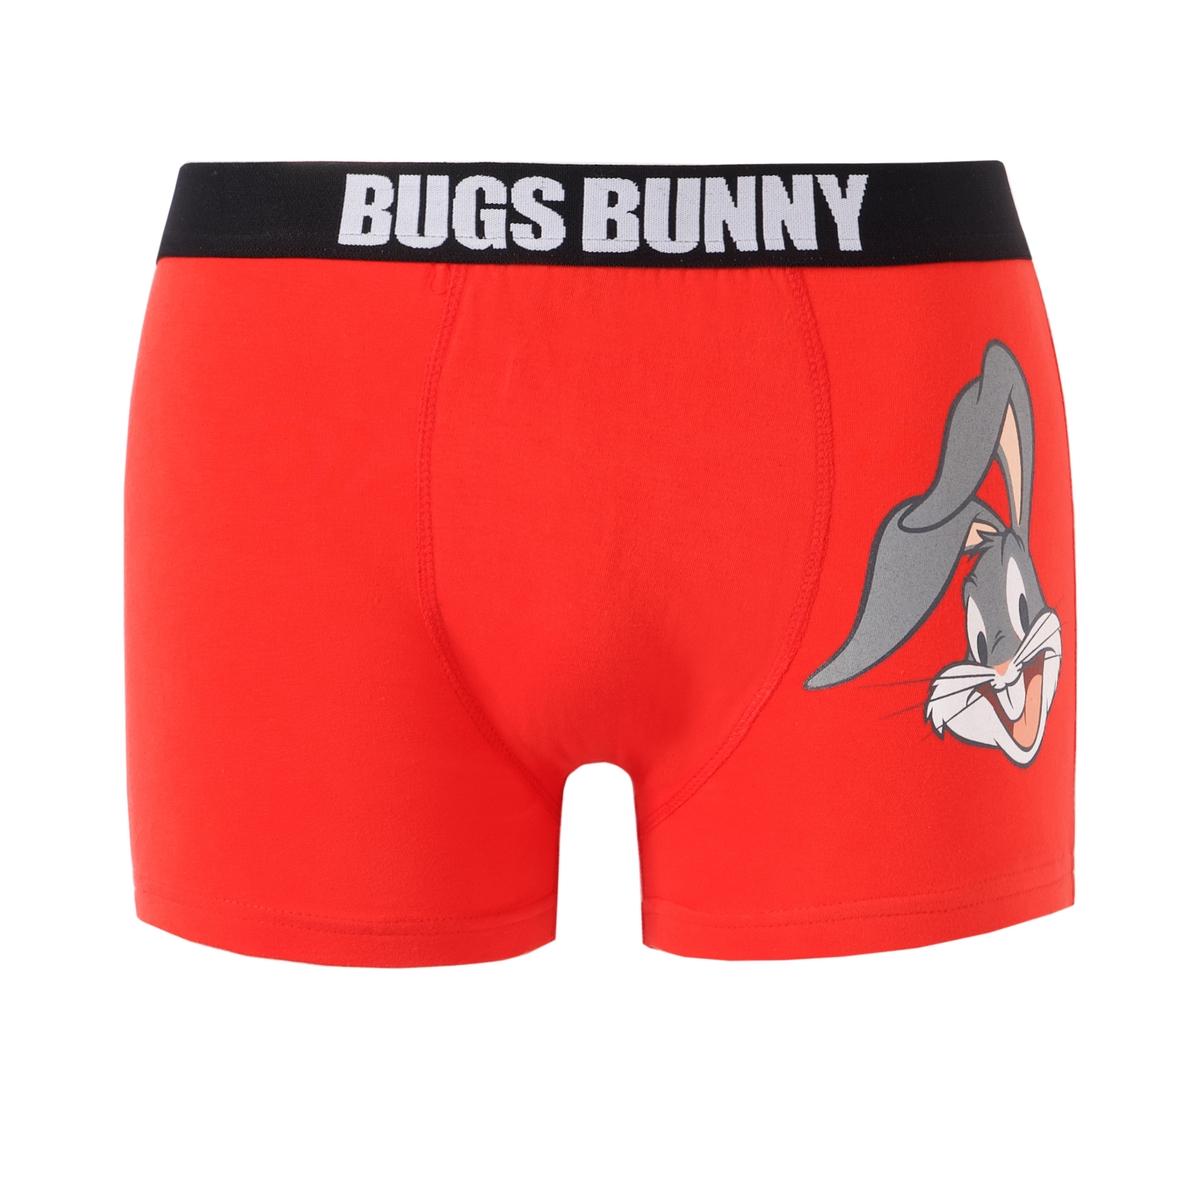 Трусы-боксеры  Bugs Bunny jianjiang мужские трусы боксеры